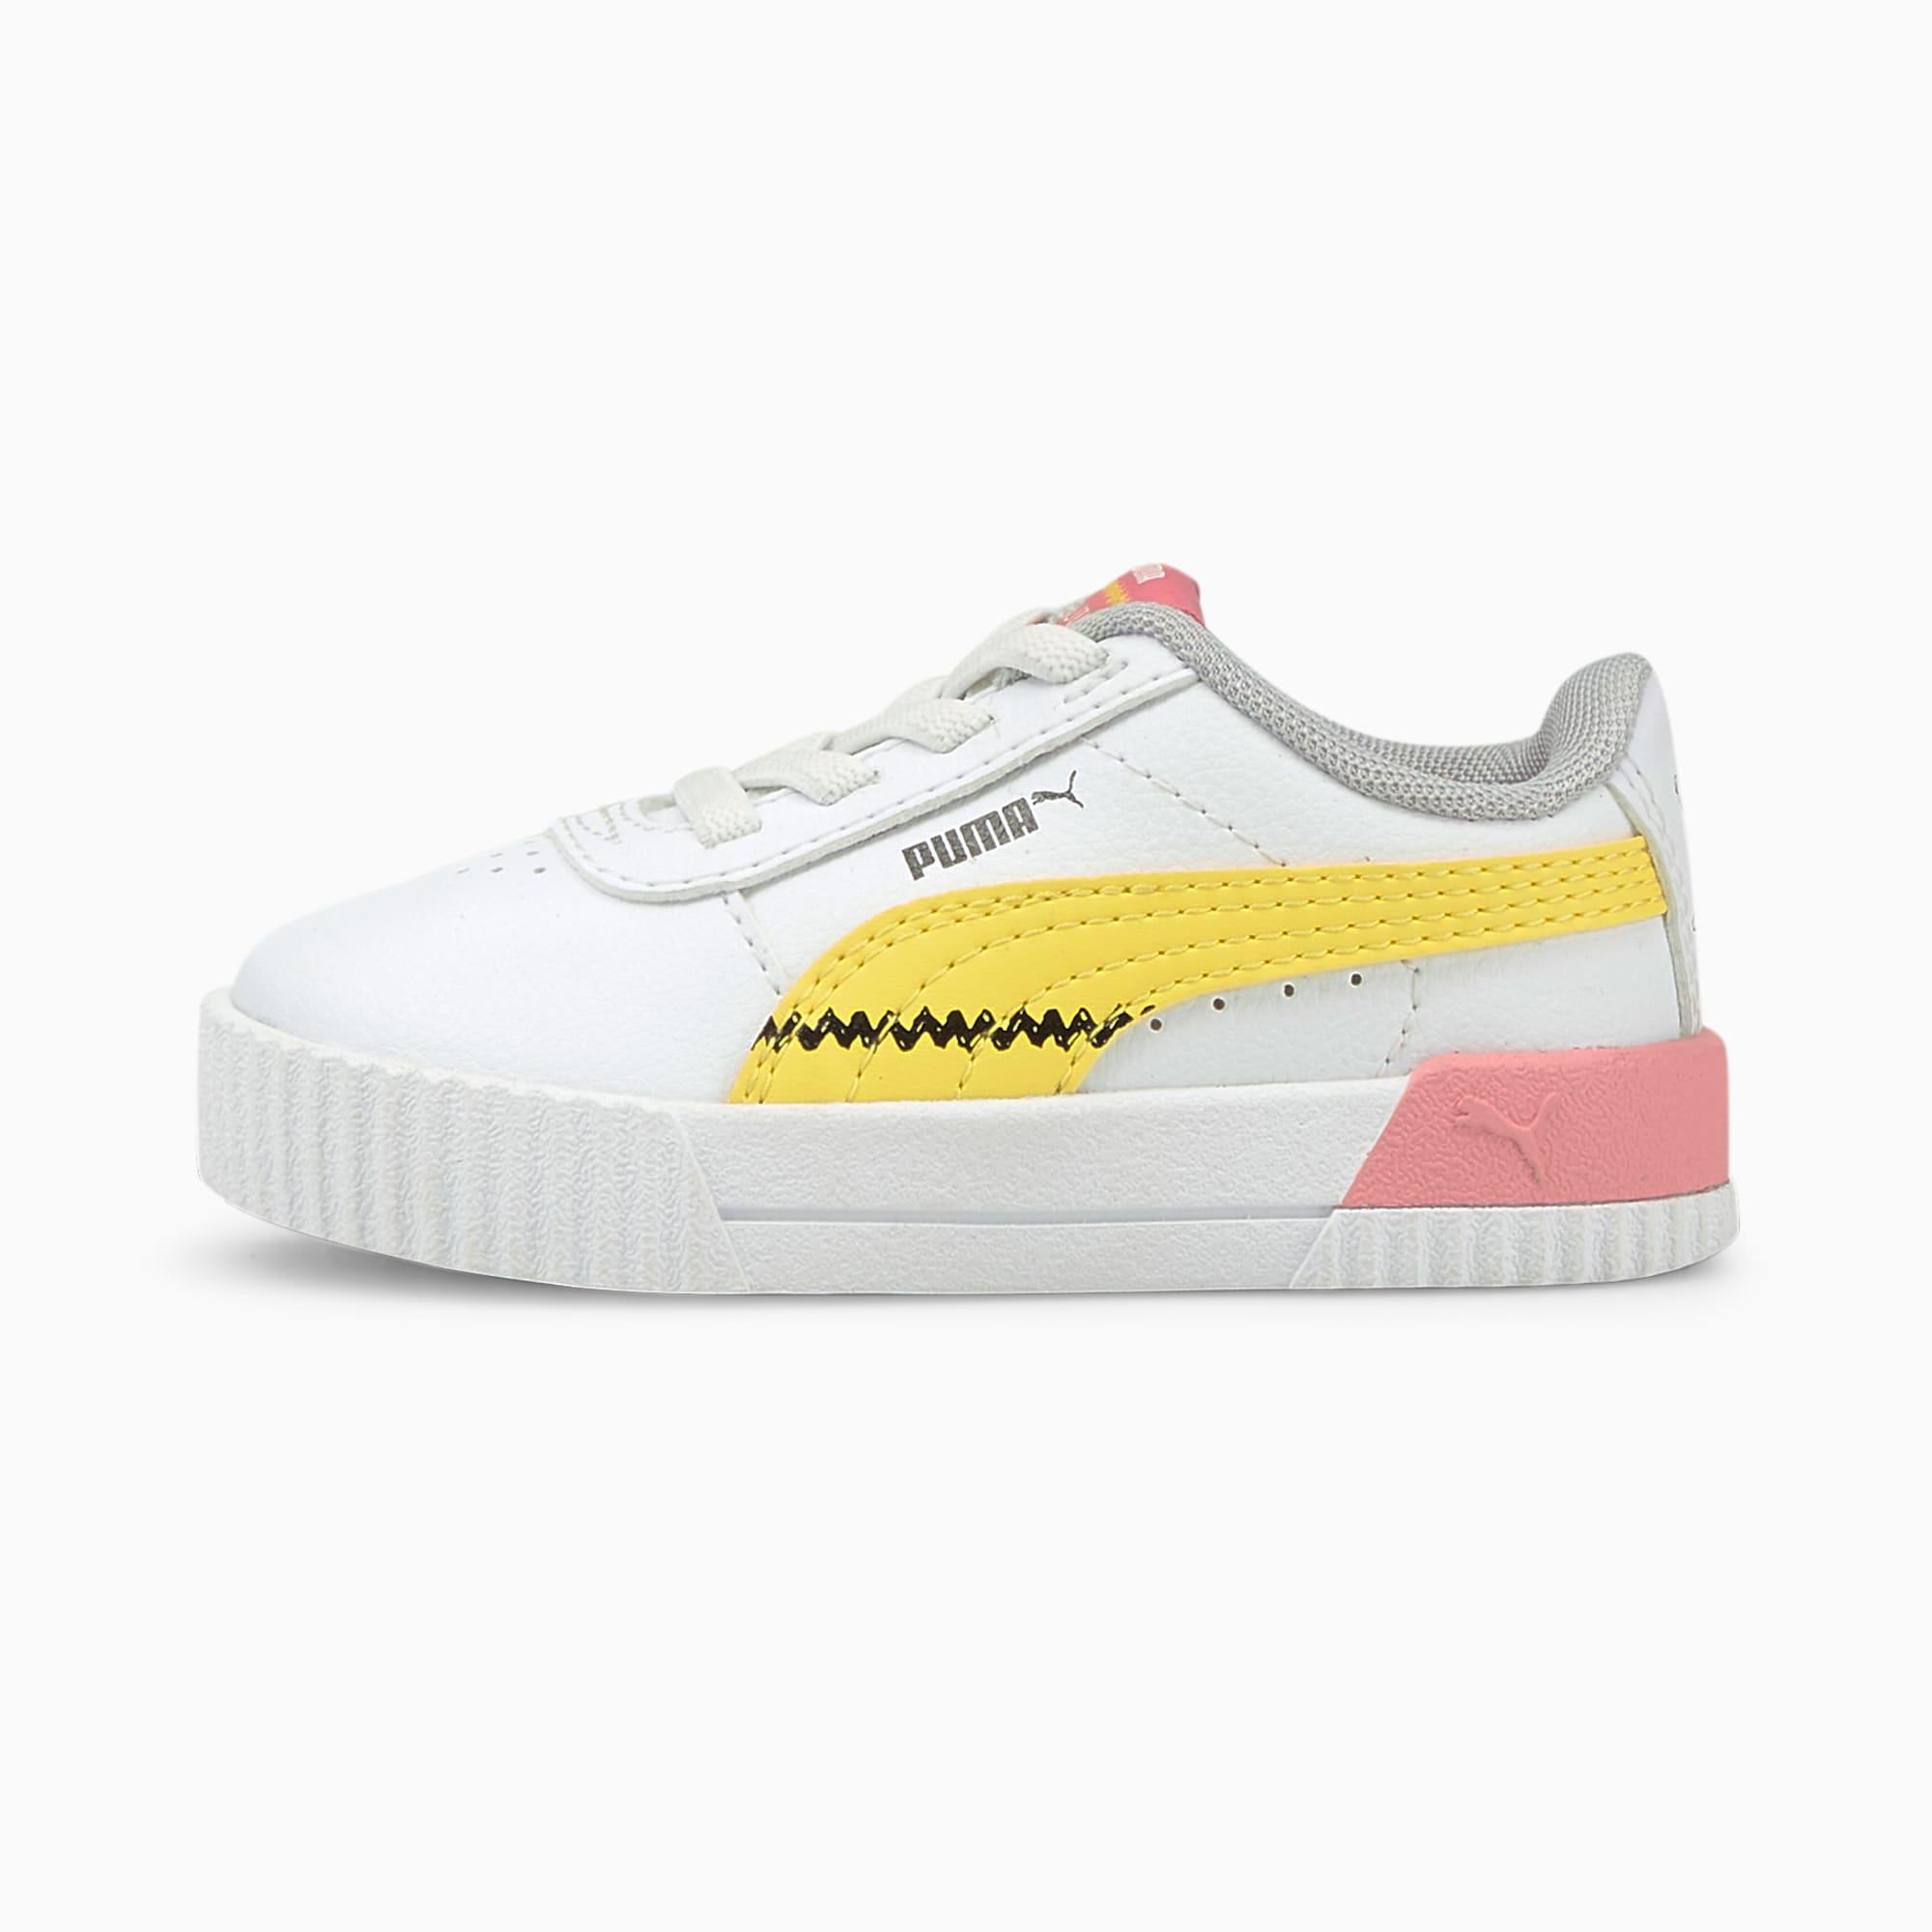 PUMA x PEANUTS Carina AC Toddler Sneakers